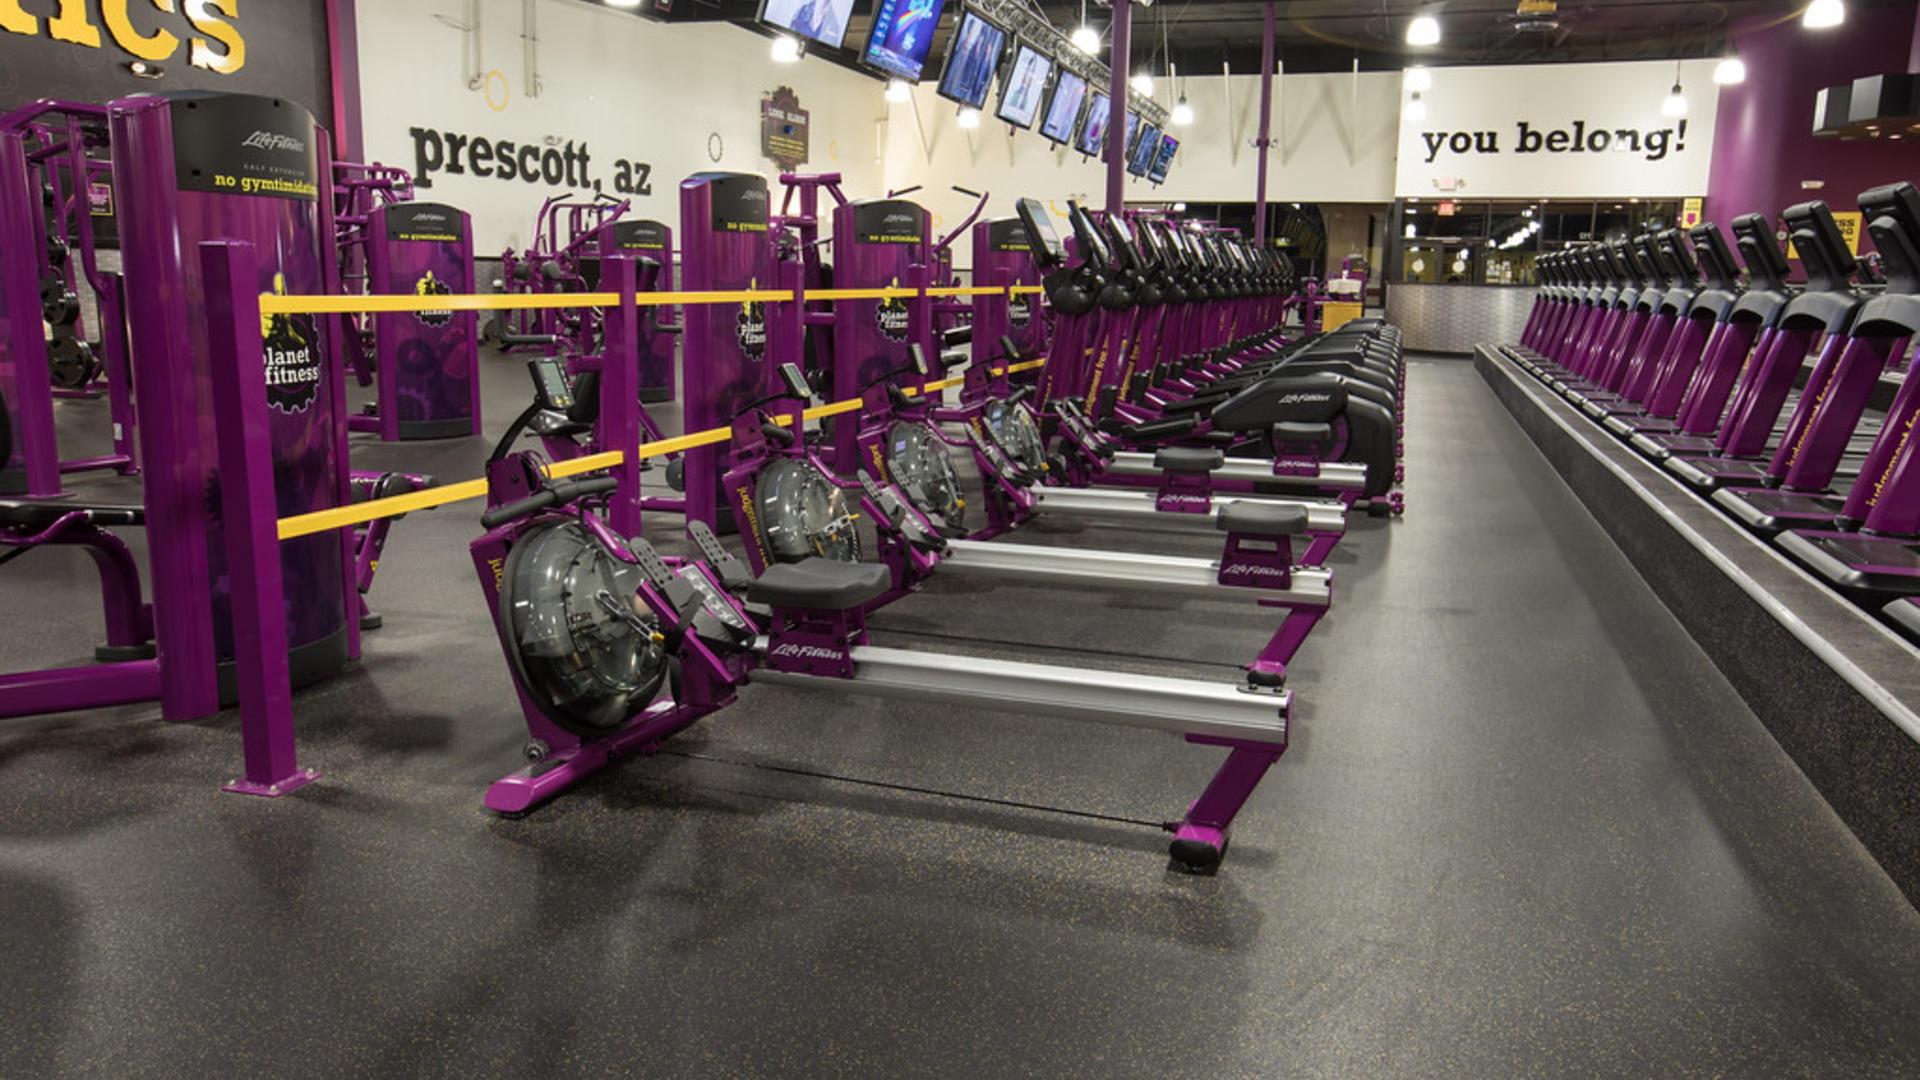 Gym In Prescott AZ 1841 E State Hwy 69 Ste 112 Planet Fitness